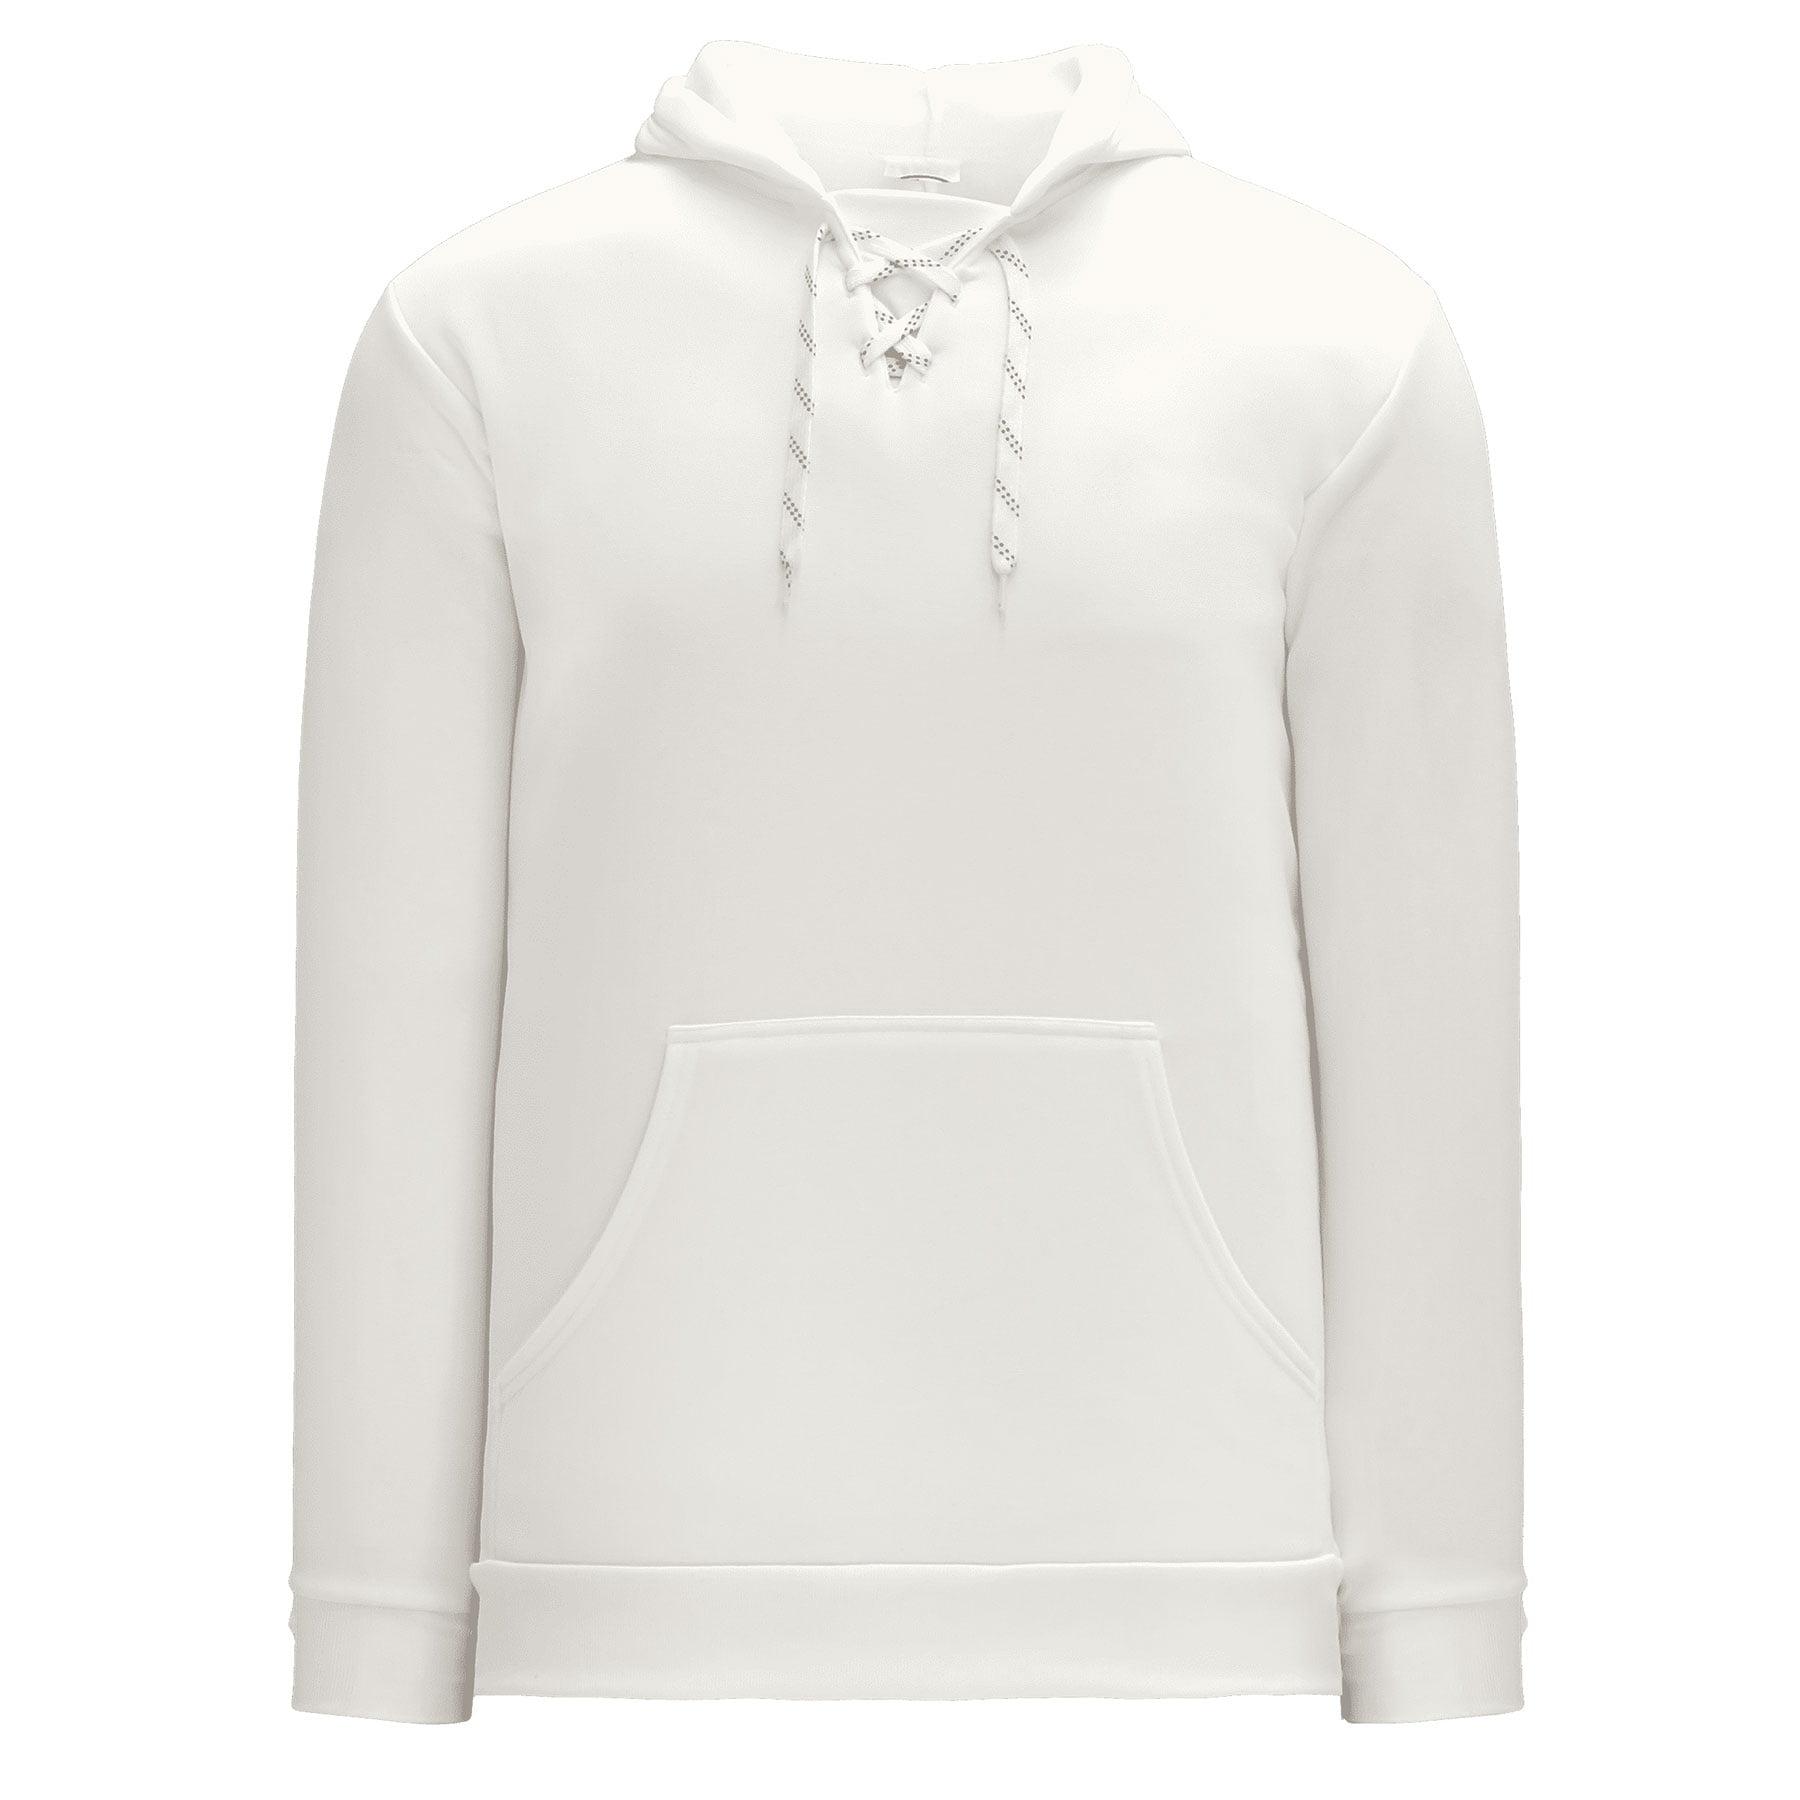 Skate Lace Athletic Kangaroo Hoodie - White - Athletic Knit - image 1 of 1